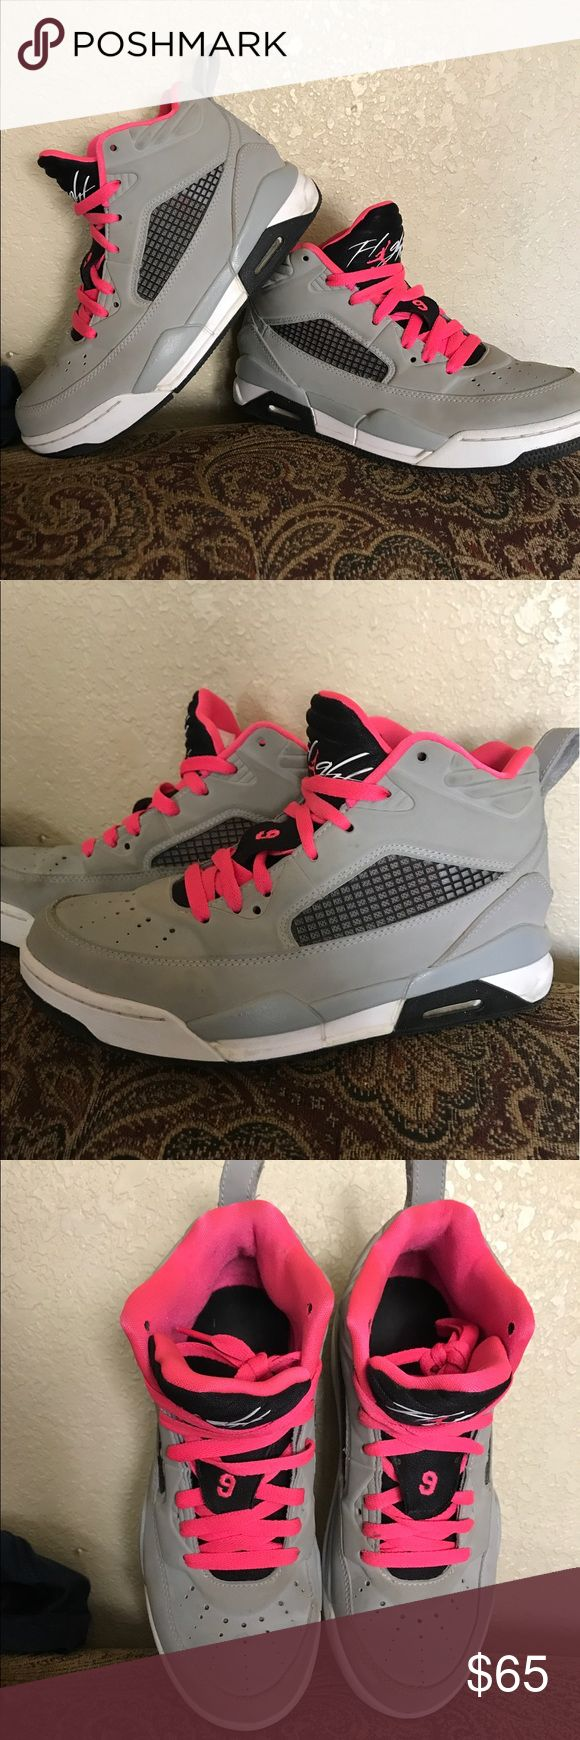 Flight Jordans Very good condition worn 4 times. Size 7 in women's Jordan Shoes Sneakers